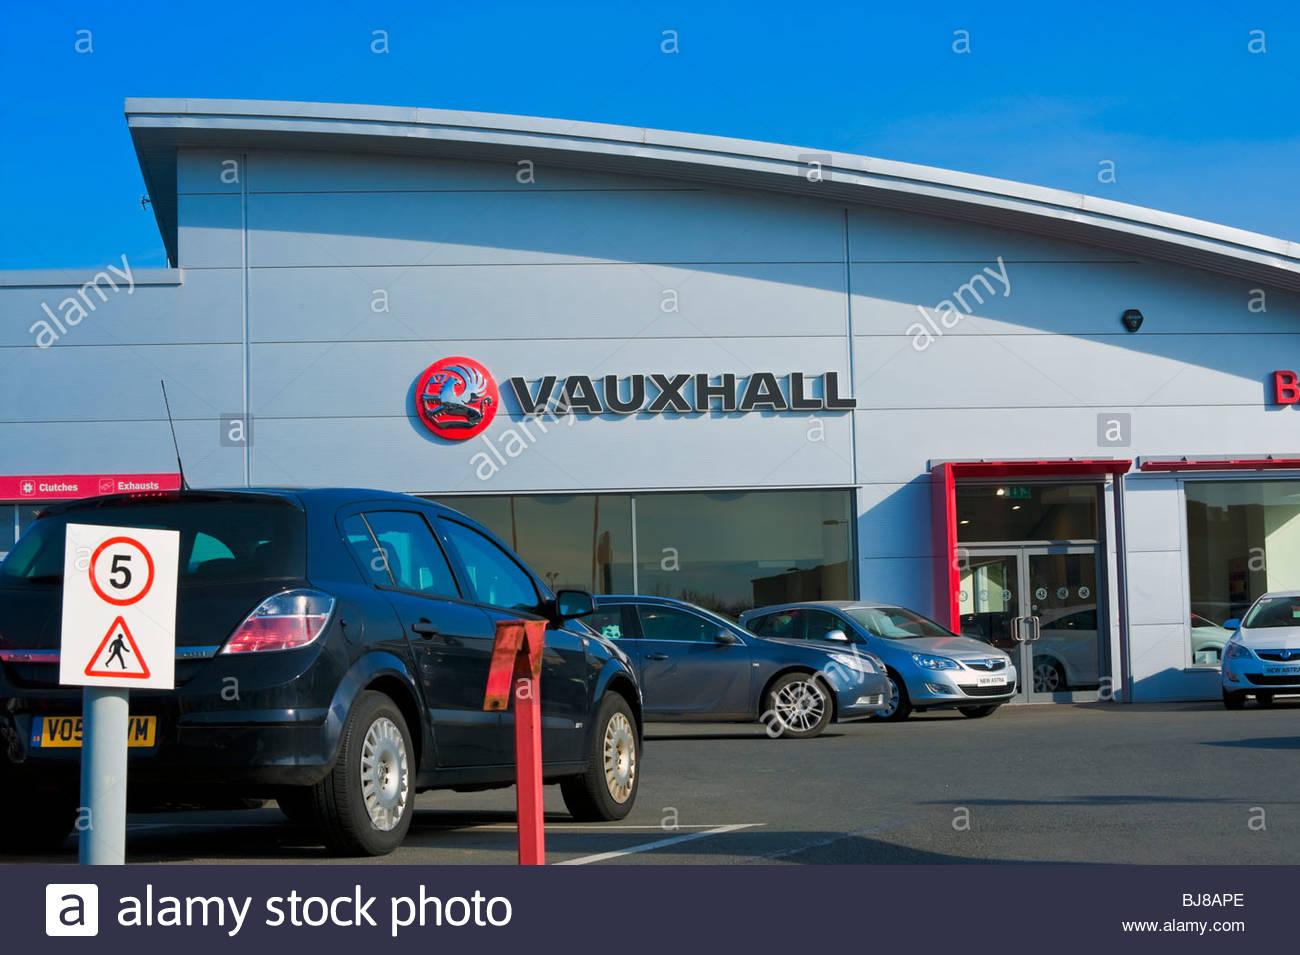 Drive Vauxhall Used Vauxhall New Vauxhall Dealers Html